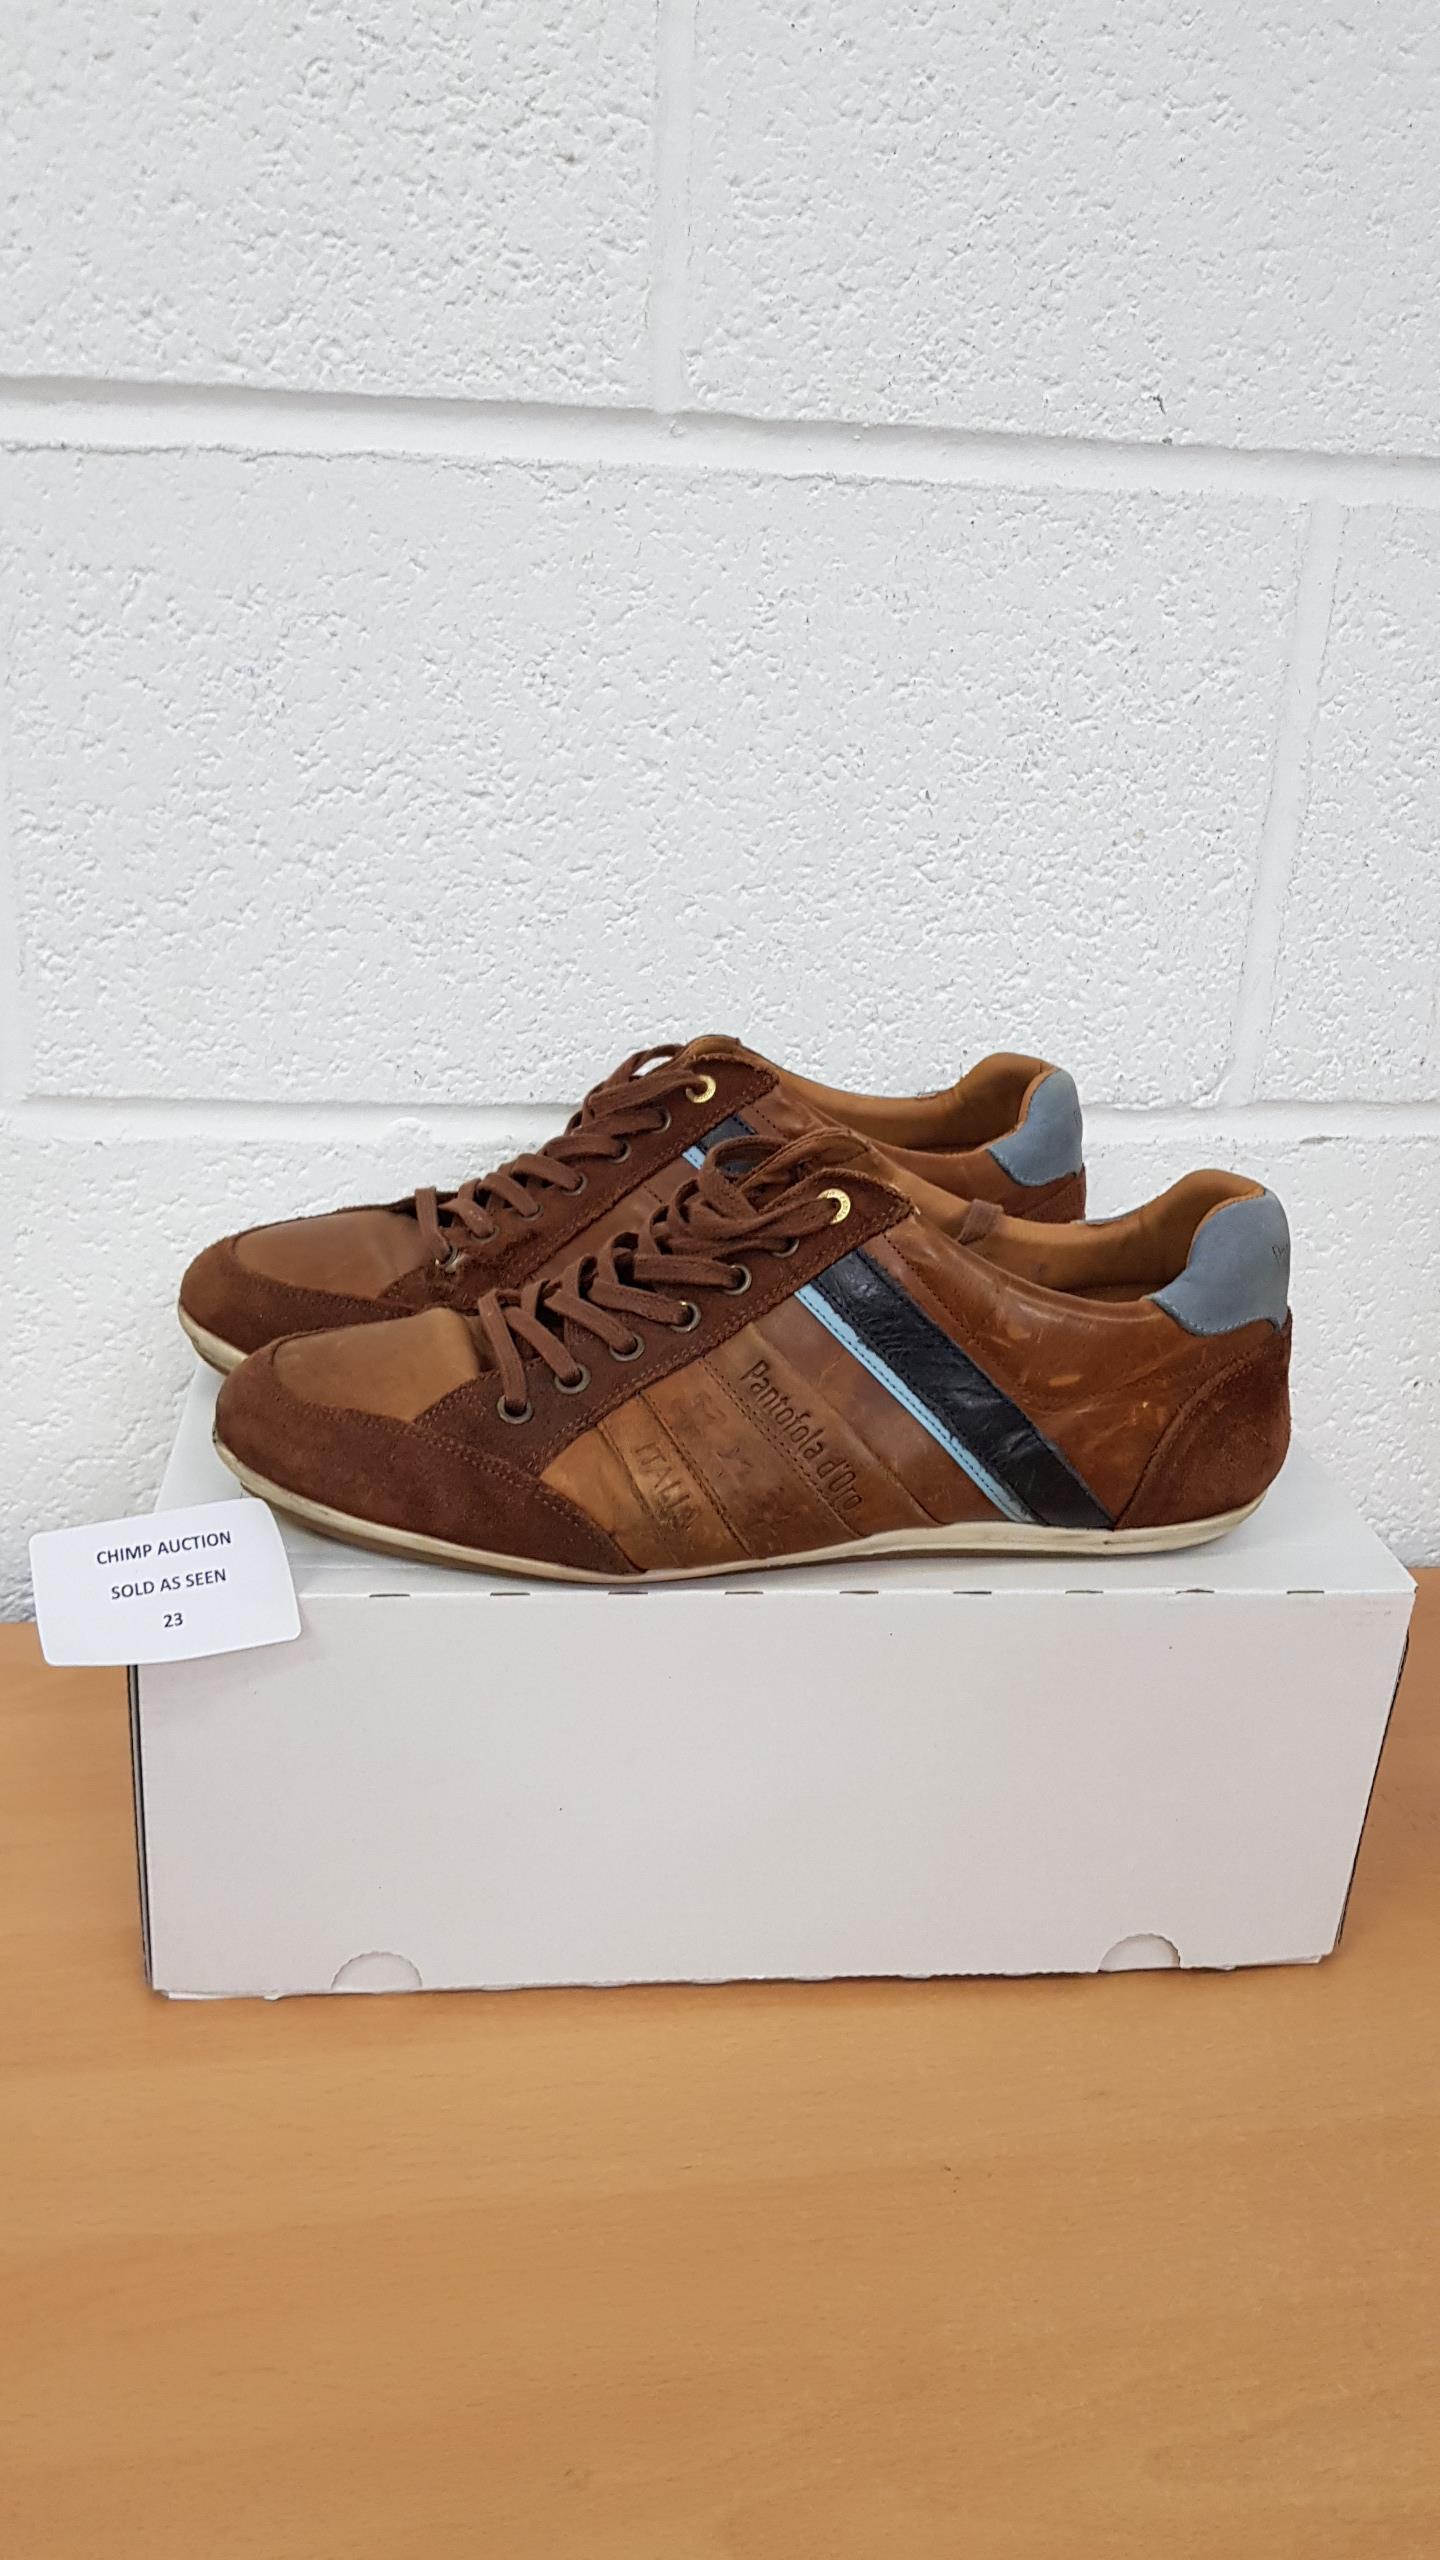 Lot 23 - Pantofola Doro men's shoes EU 44